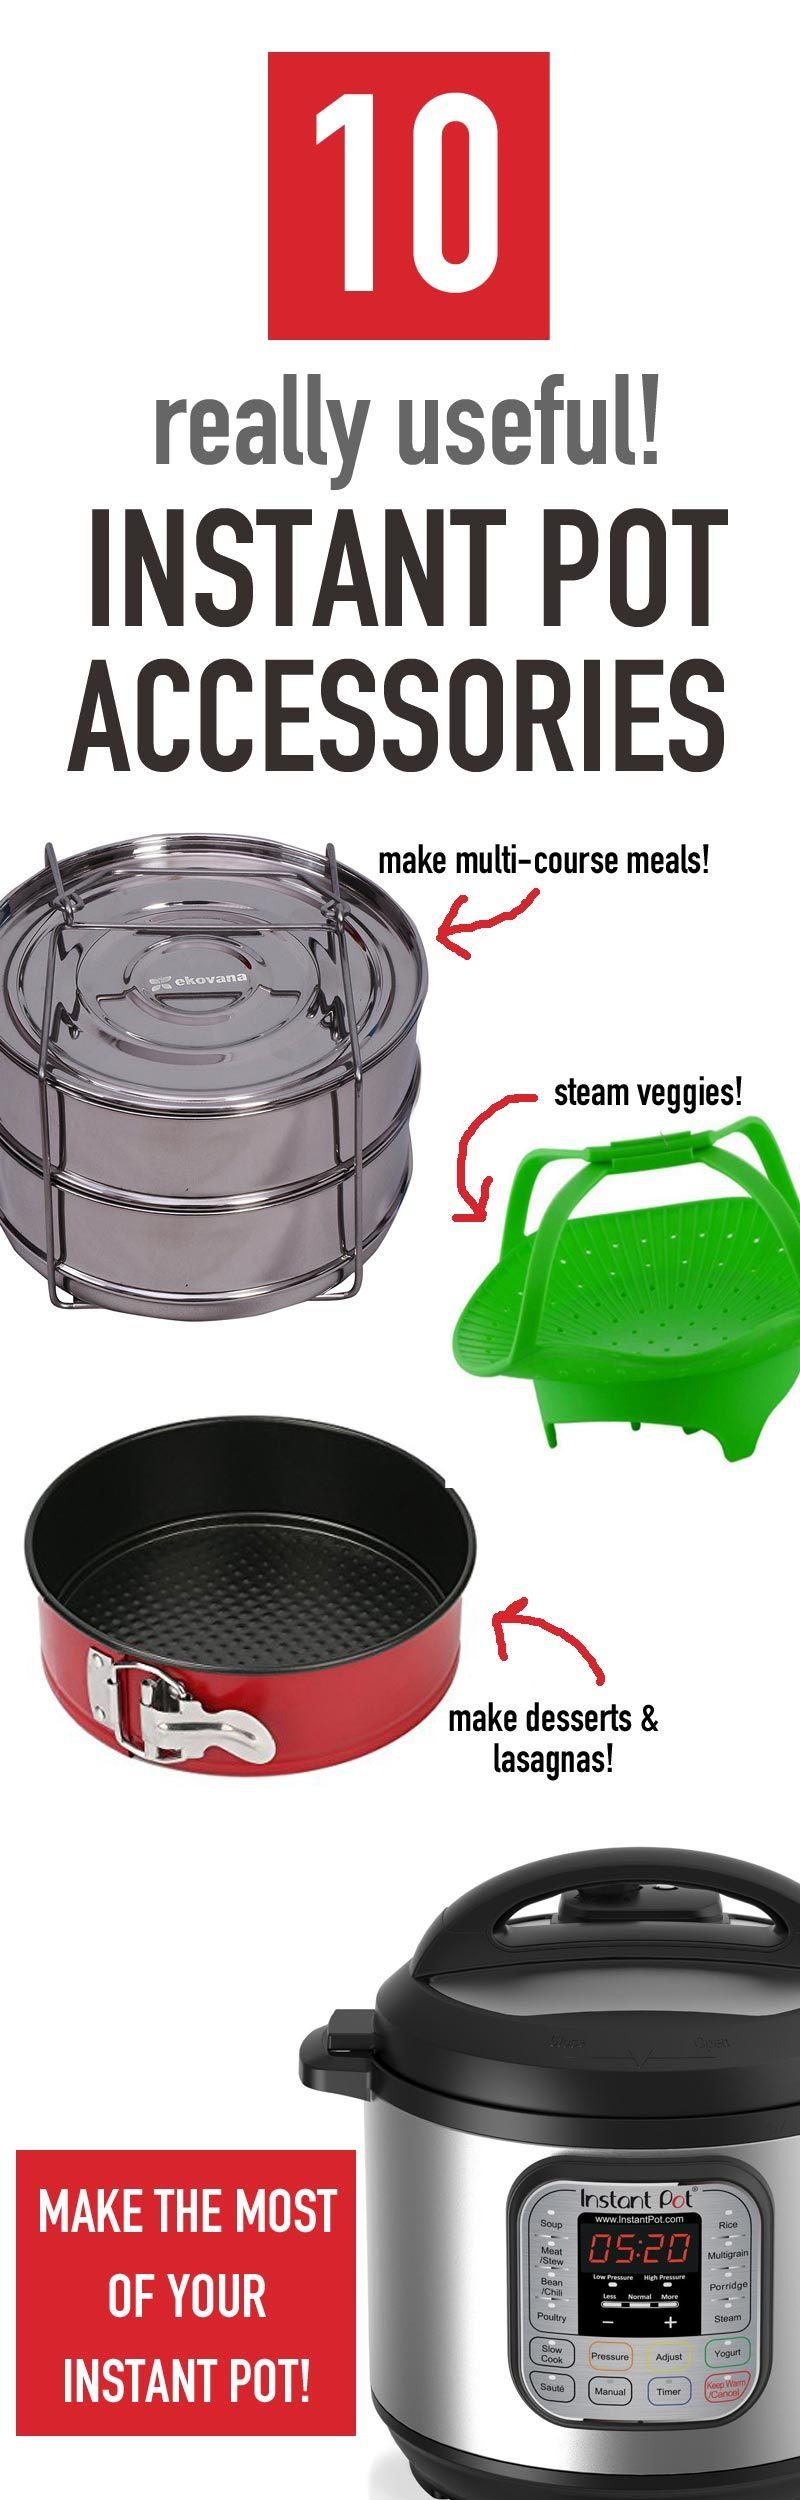 Instant pot   Instant pot accessories   instant pot recipe #instantpotaccessories #instantpot